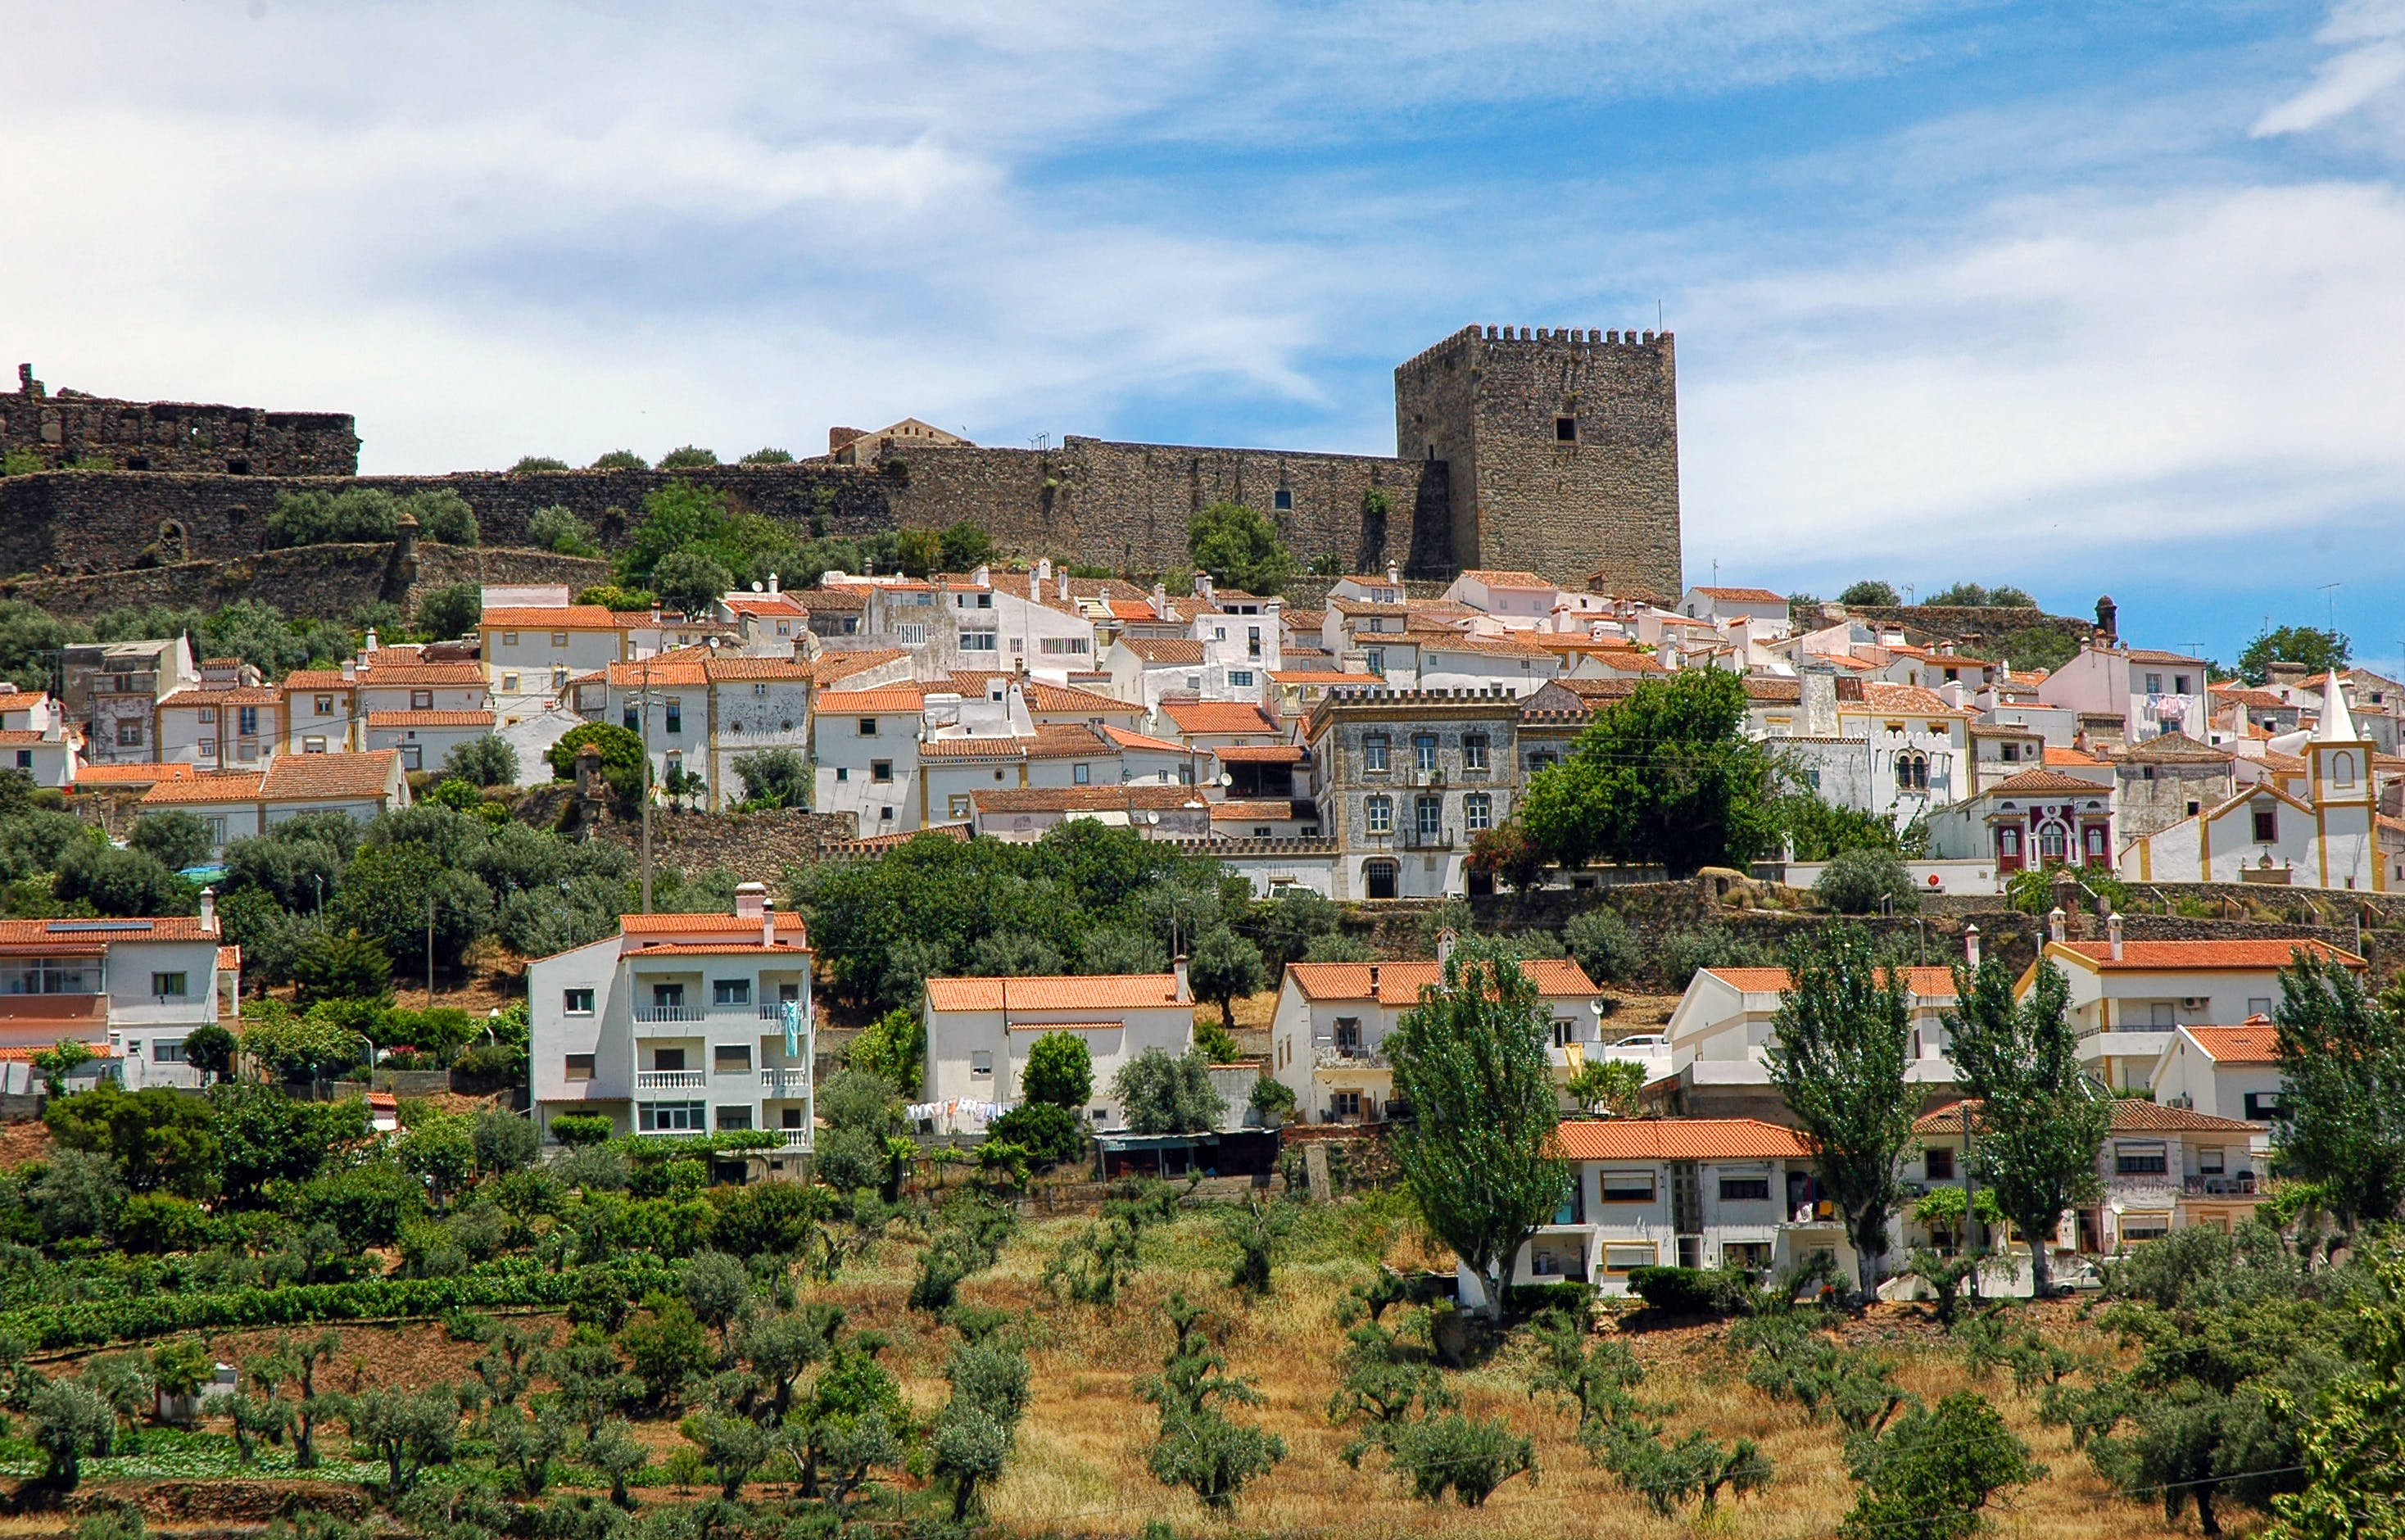 Free stock photo of alentejo, Castelo de Vide, castle, city